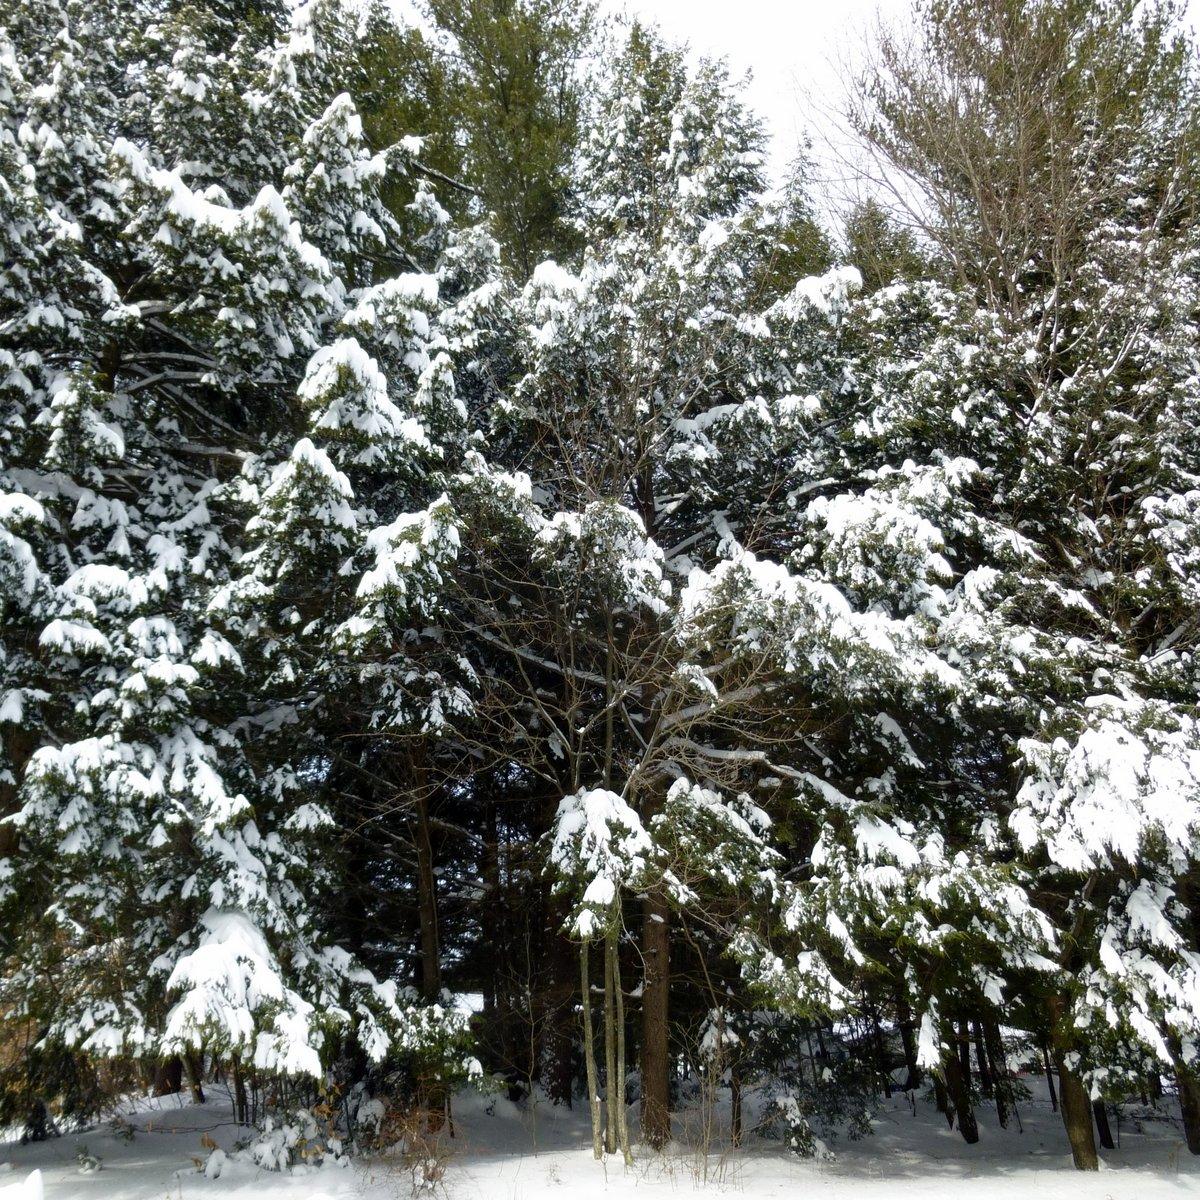 2. 2-9-13 Snowstorm